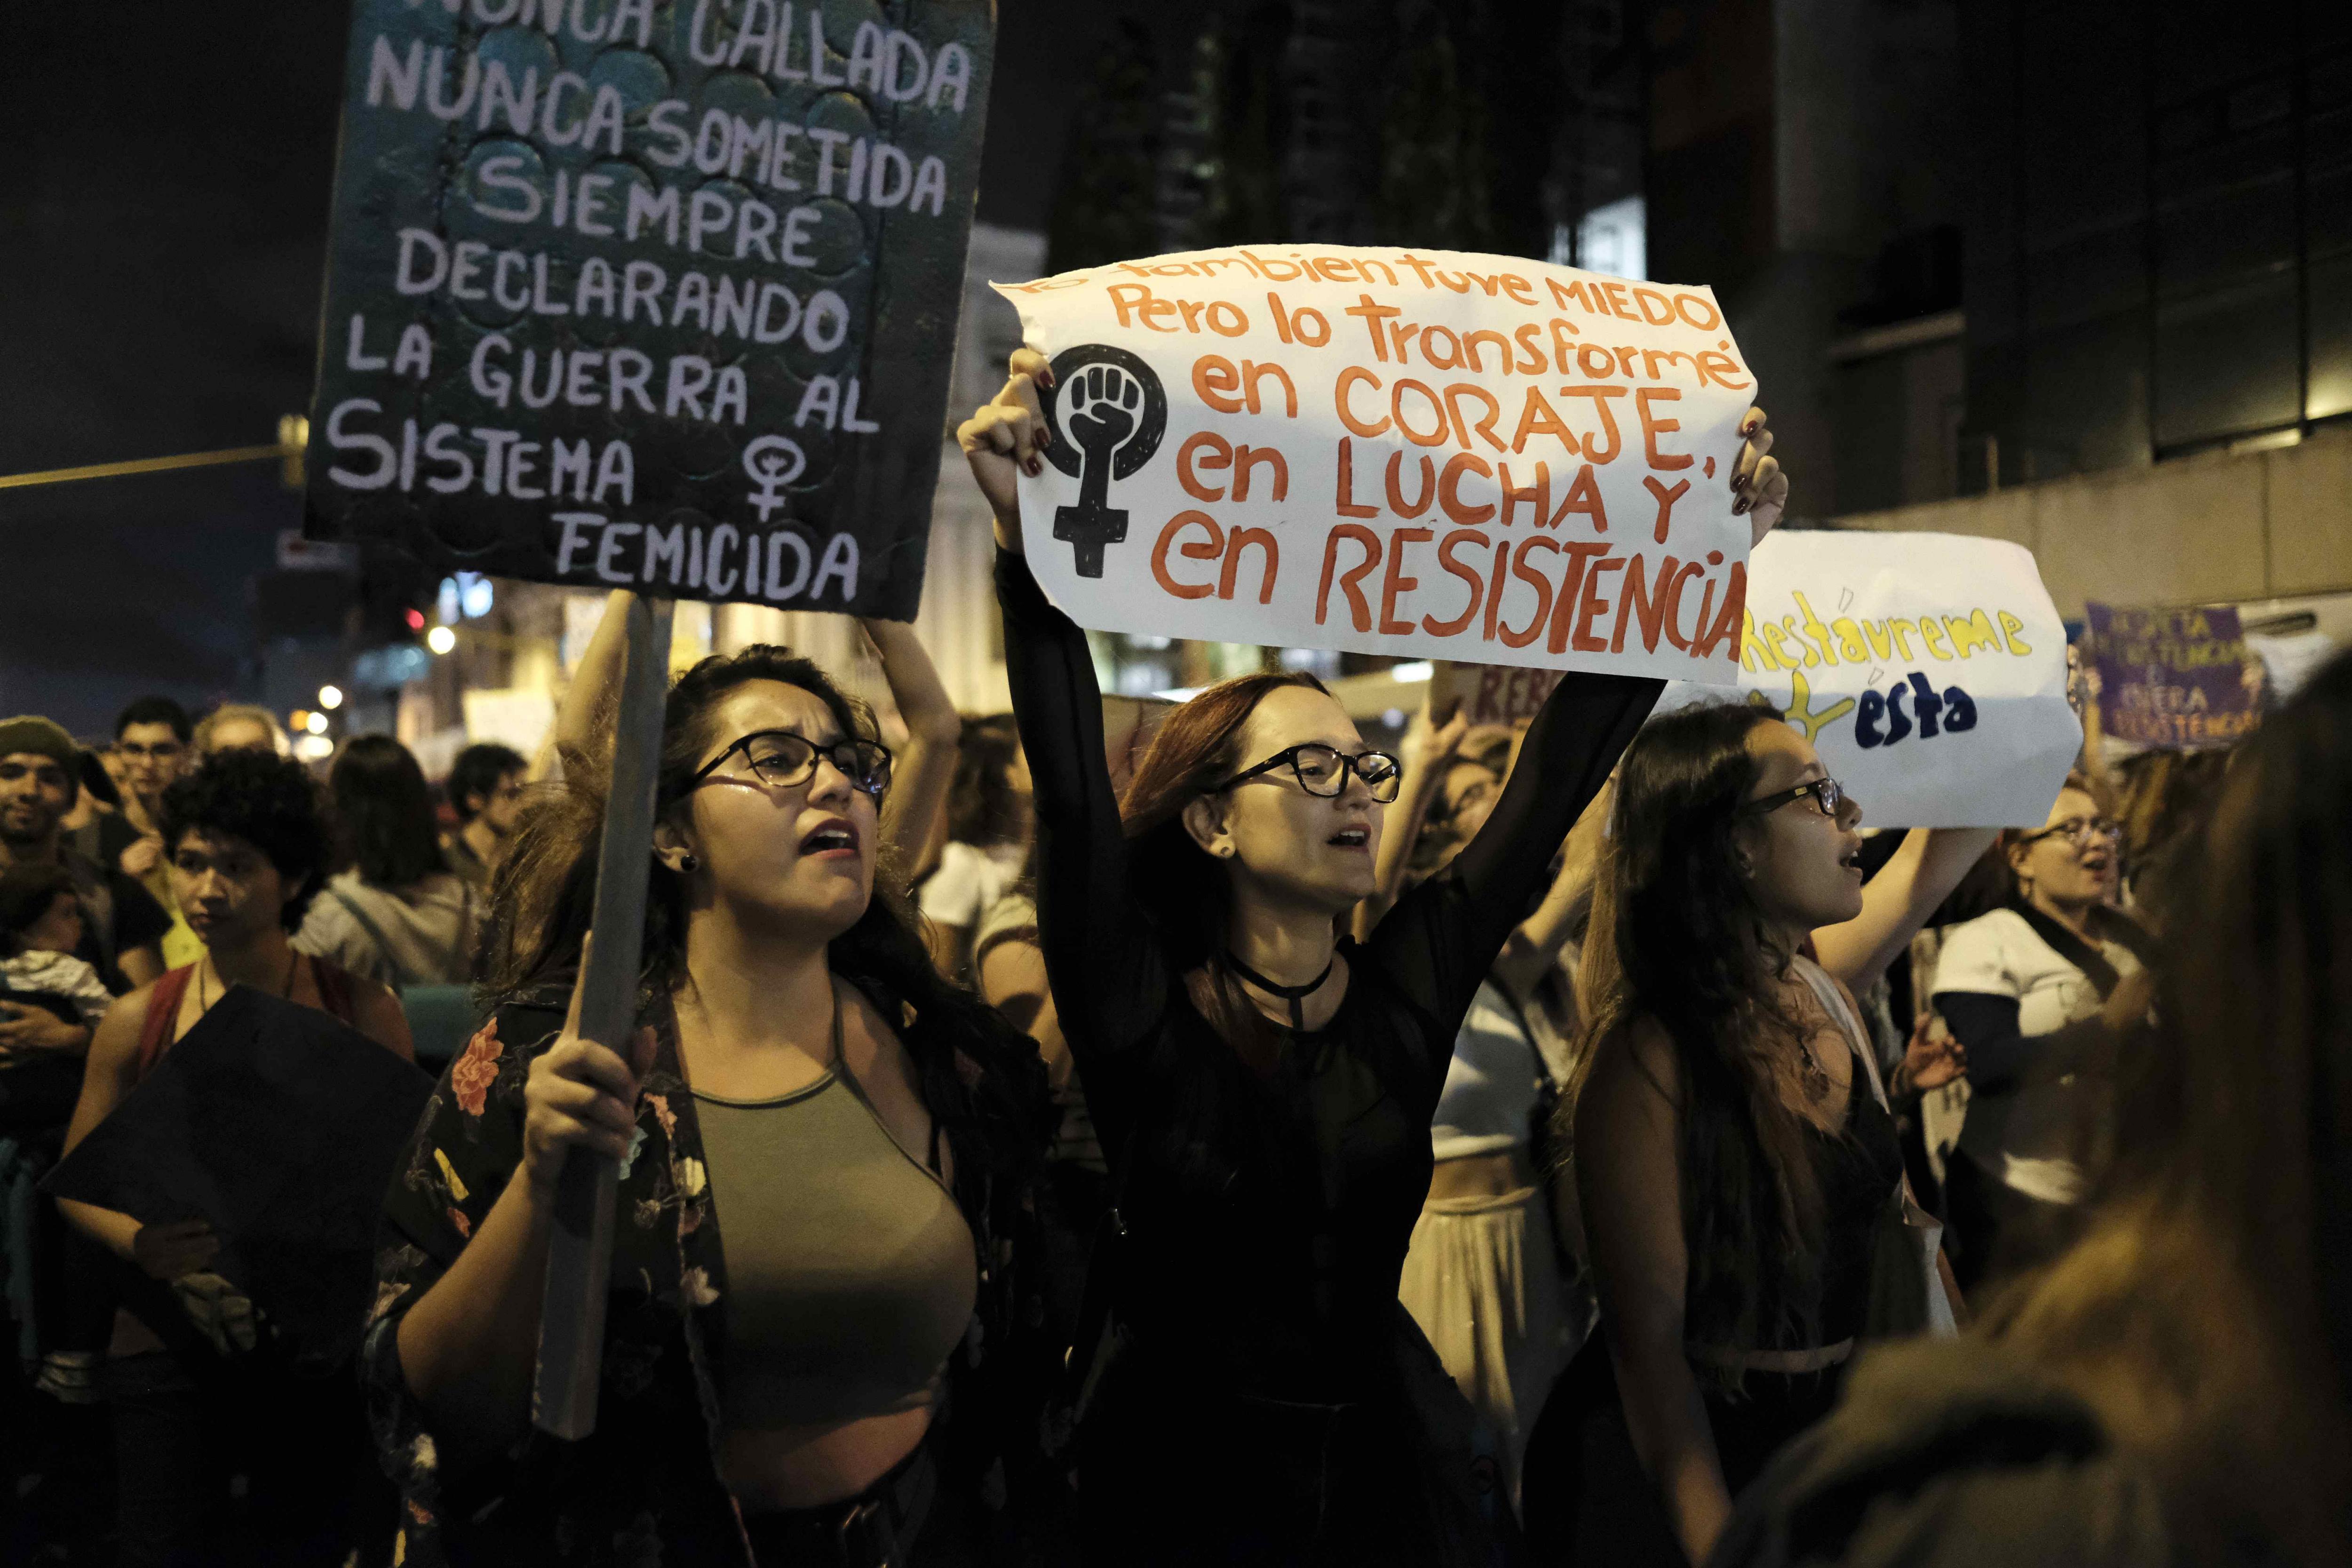 Marxa a Costa Rica per commemorar el Dia Internacional de la Dona. /JEFFREY ARGUEDAS